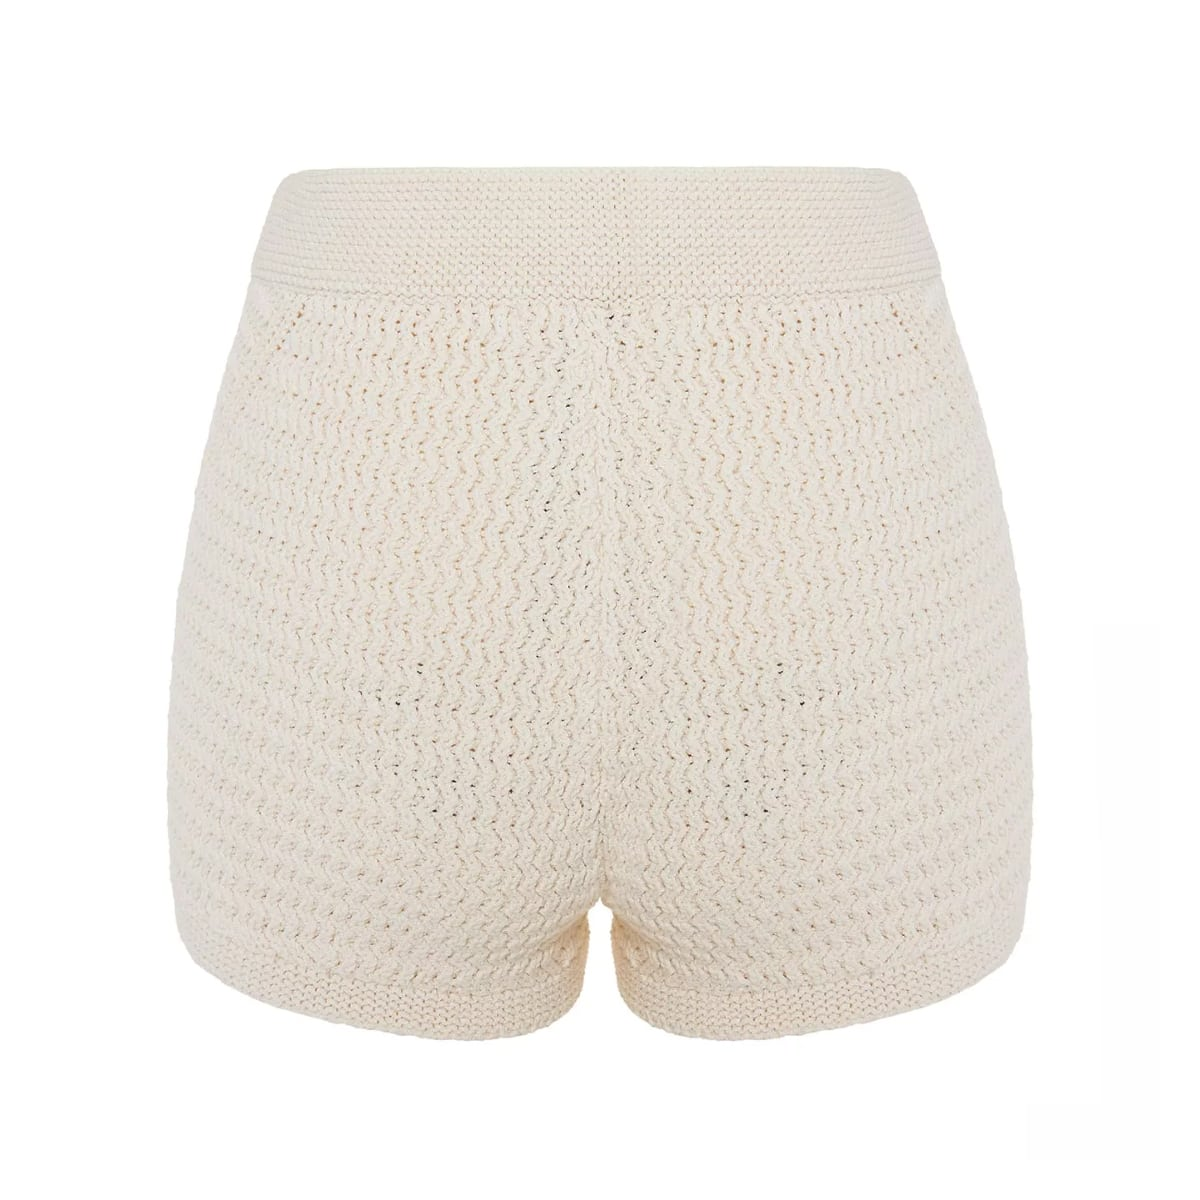 Lena knitted mini shorts